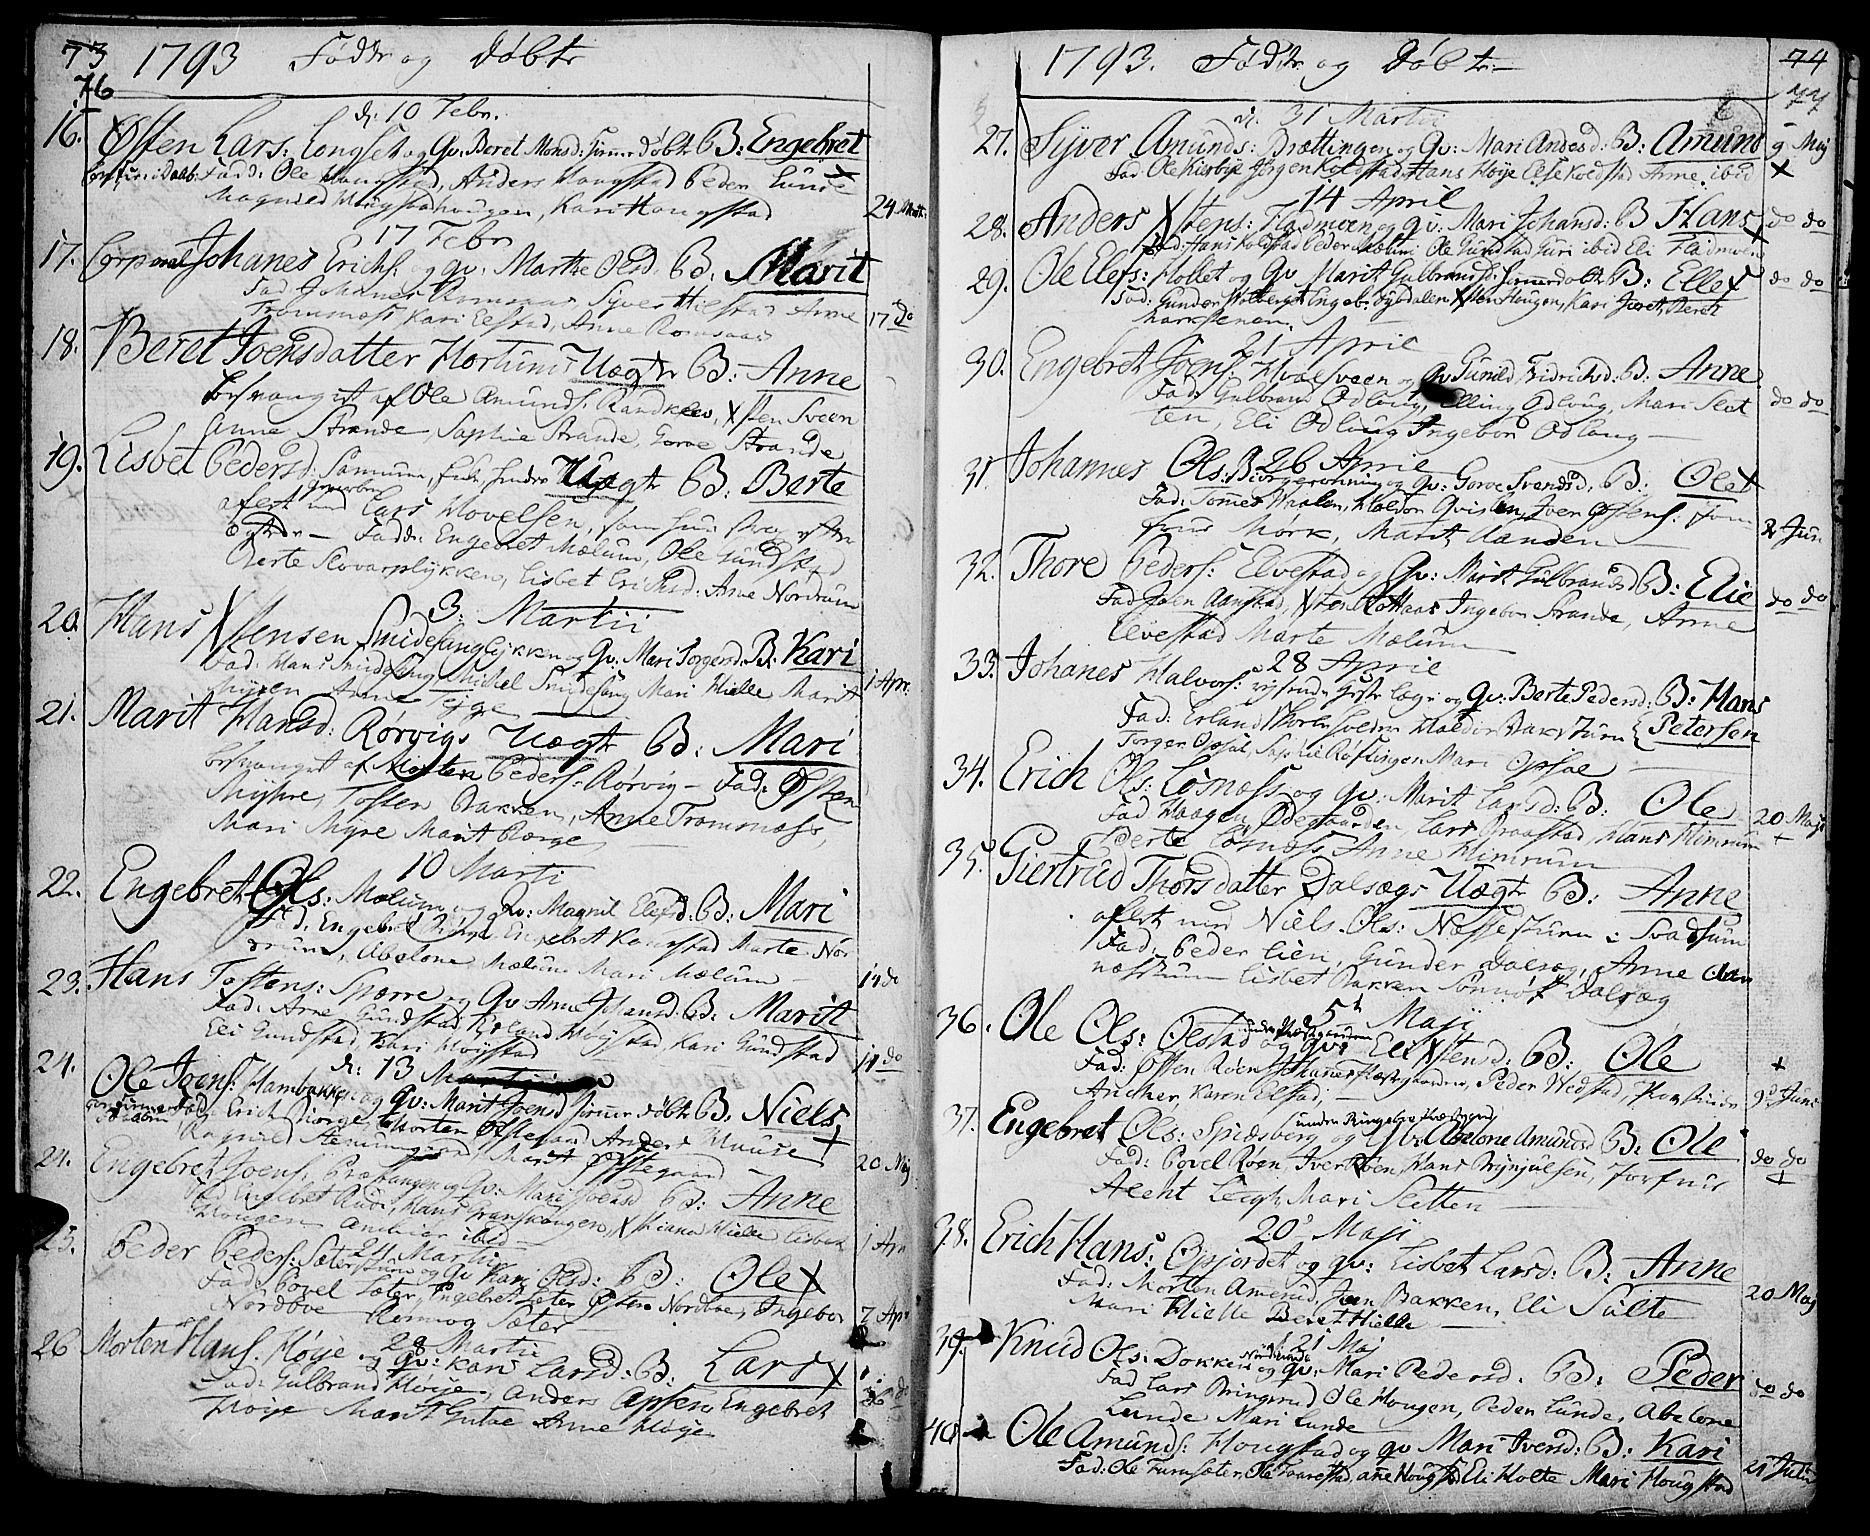 SAH, Ringebu prestekontor, Ministerialbok nr. 3, 1781-1820, s. 76-77